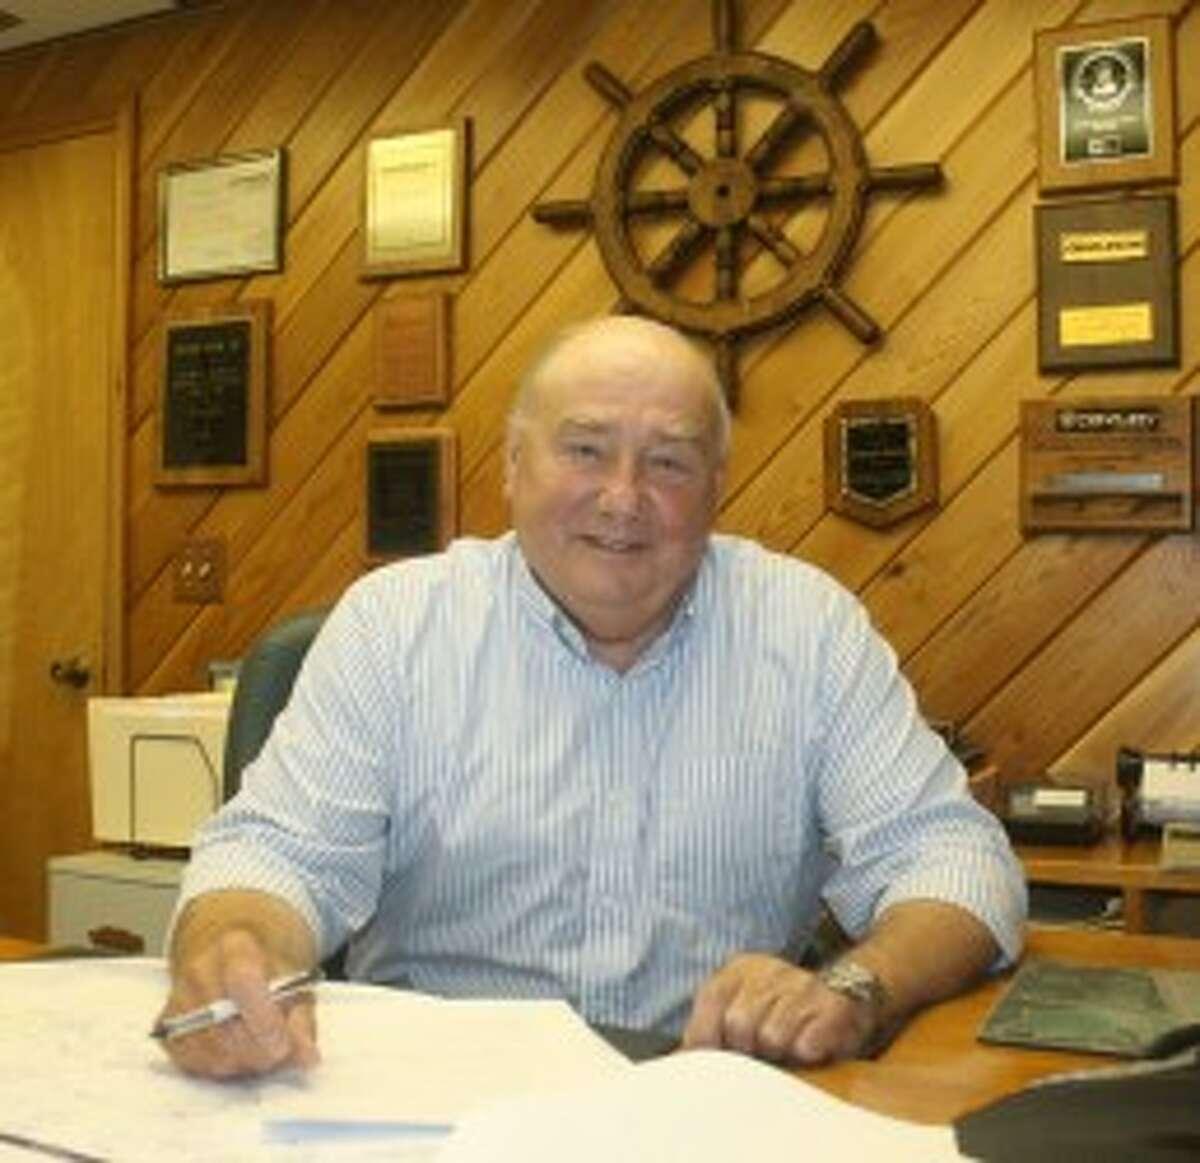 Jim Mrozinski and his family have had Onekama Marine for 49 years. (John Raffel/Pioneer News Network)